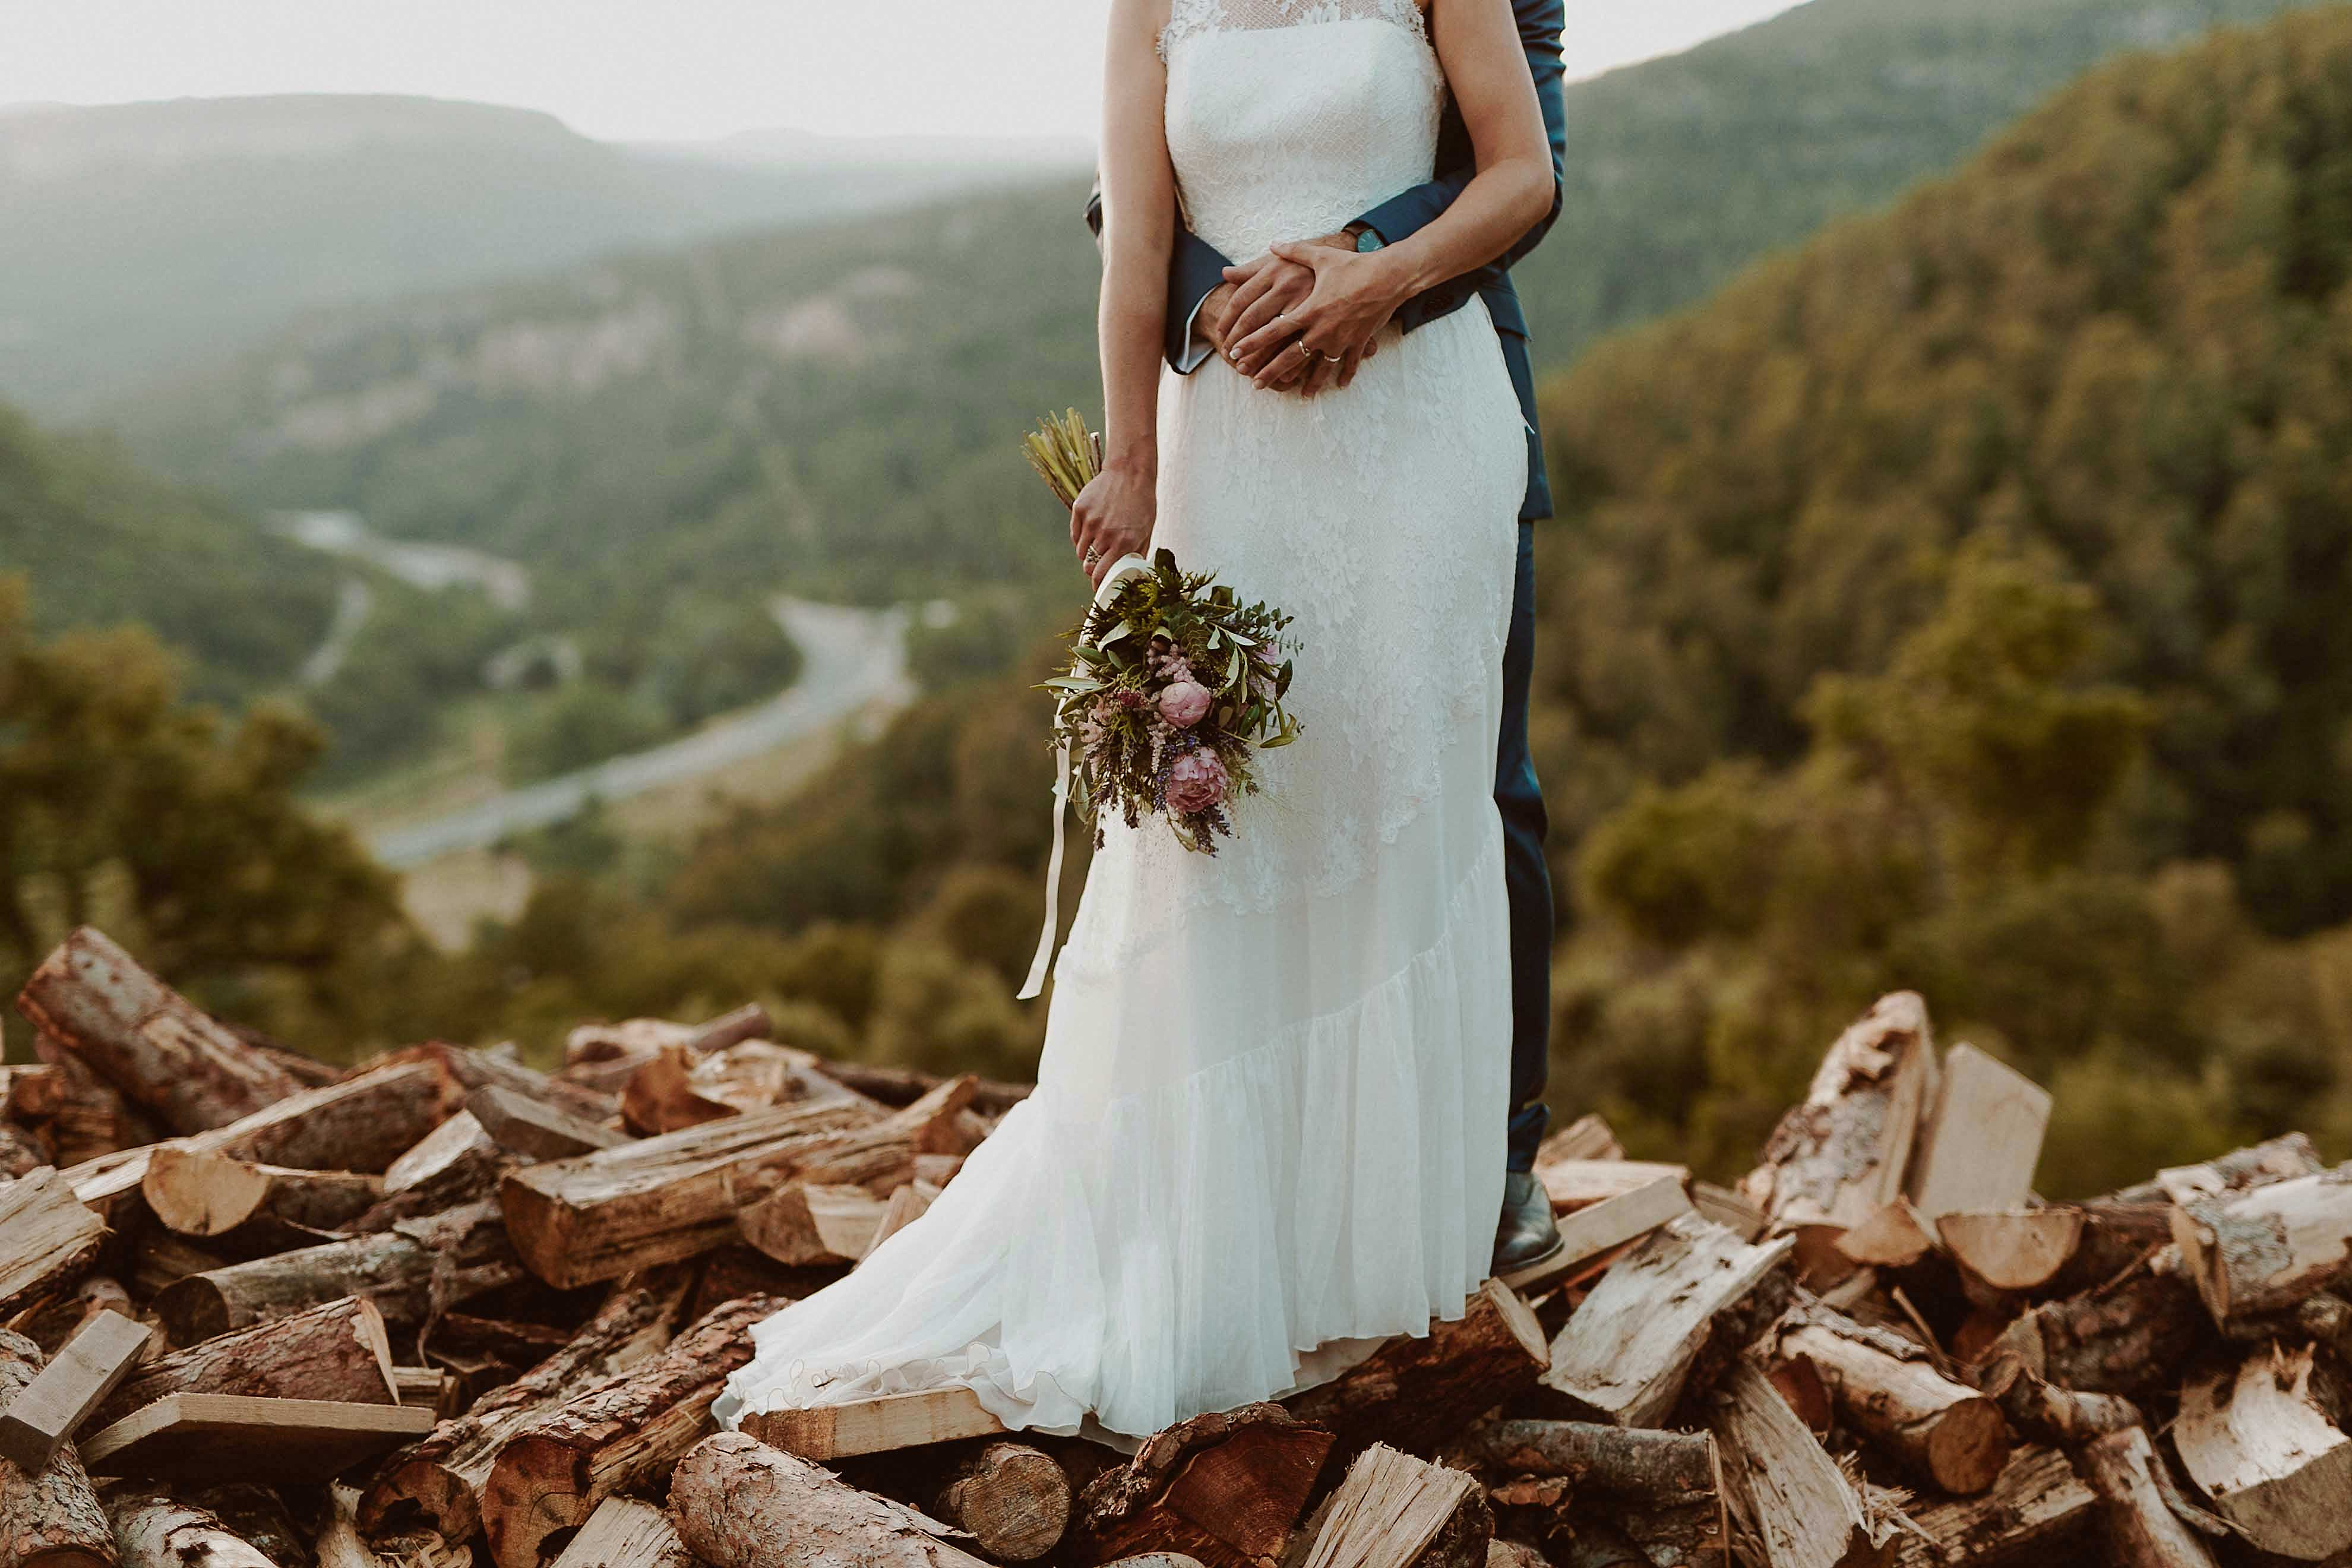 Boda rústica en la montaña. fotgrafo de bodas barcelona_082